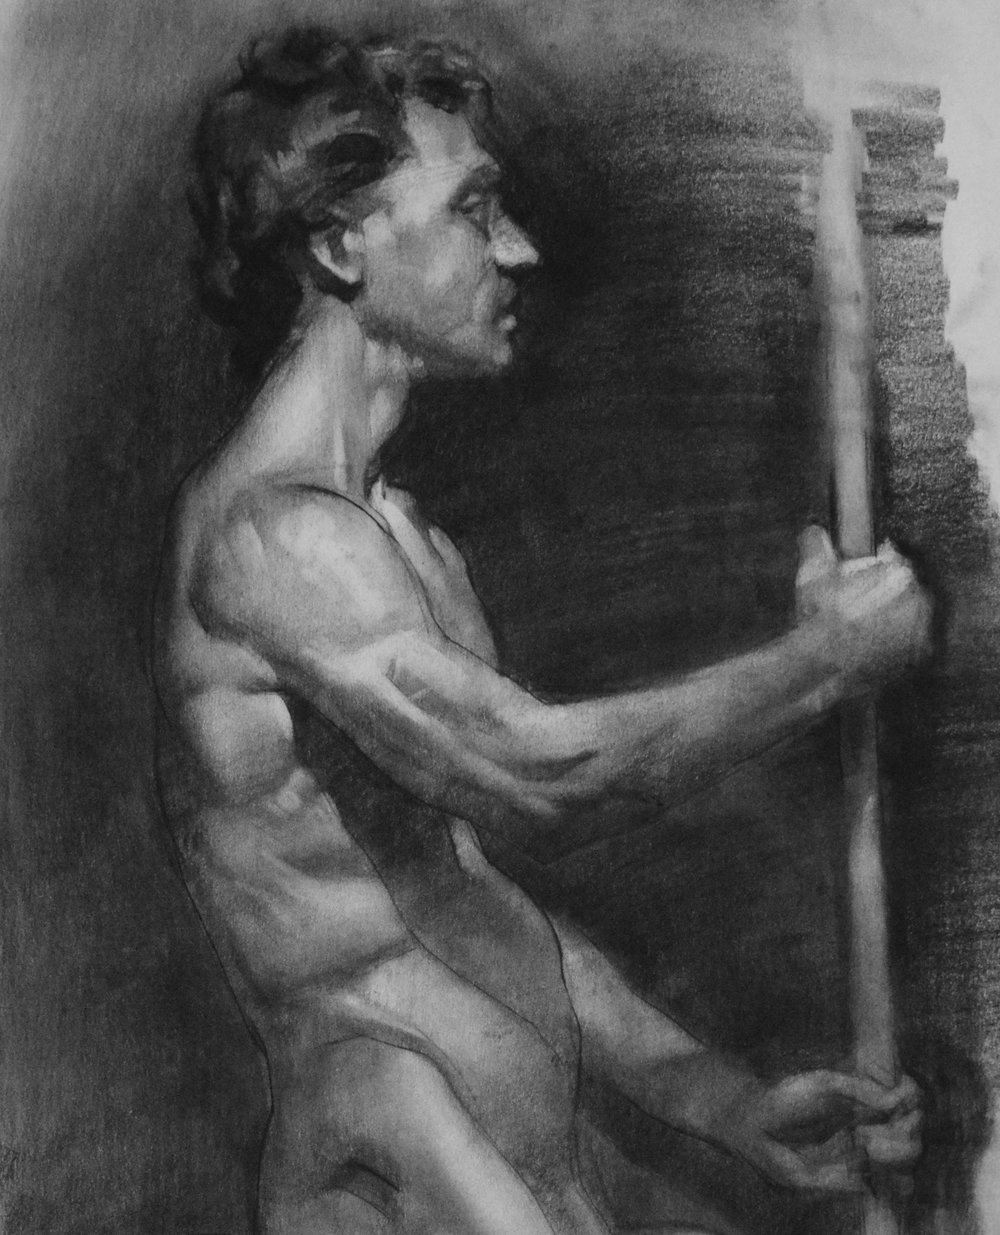 Charcoal_AnatomyStudies_Male_04.jpg